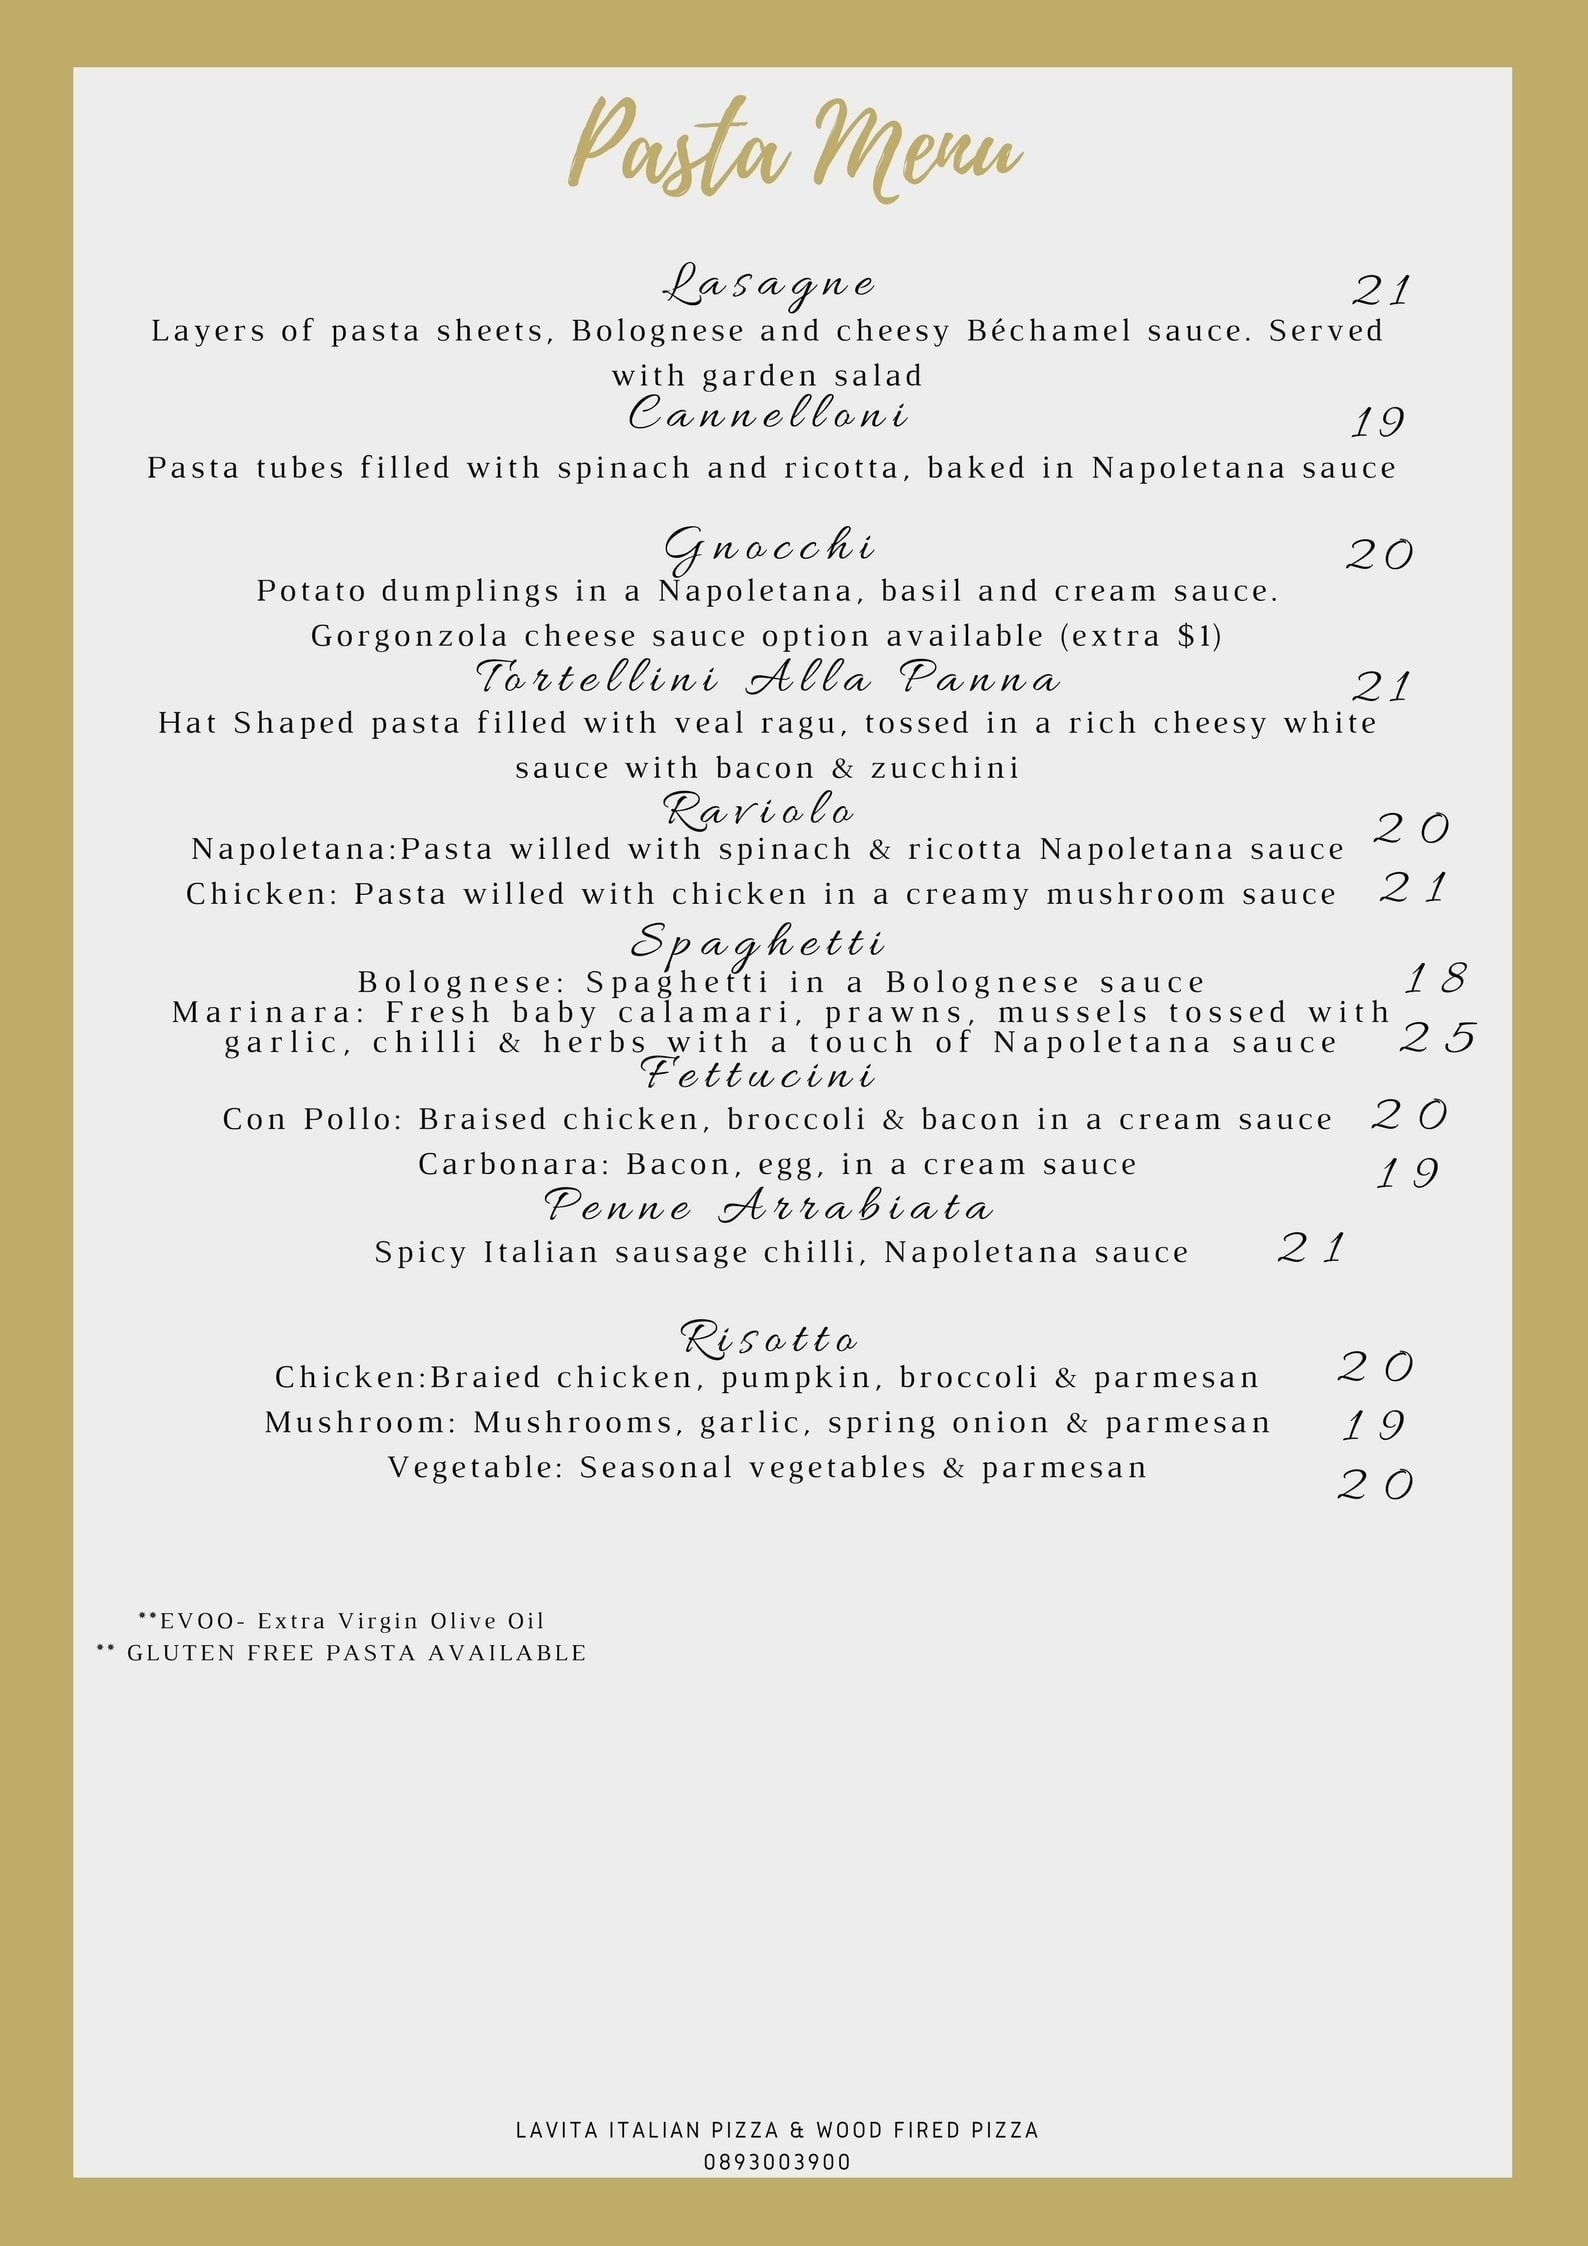 Lavita Italian Restaurant Joondalup Perth क मन